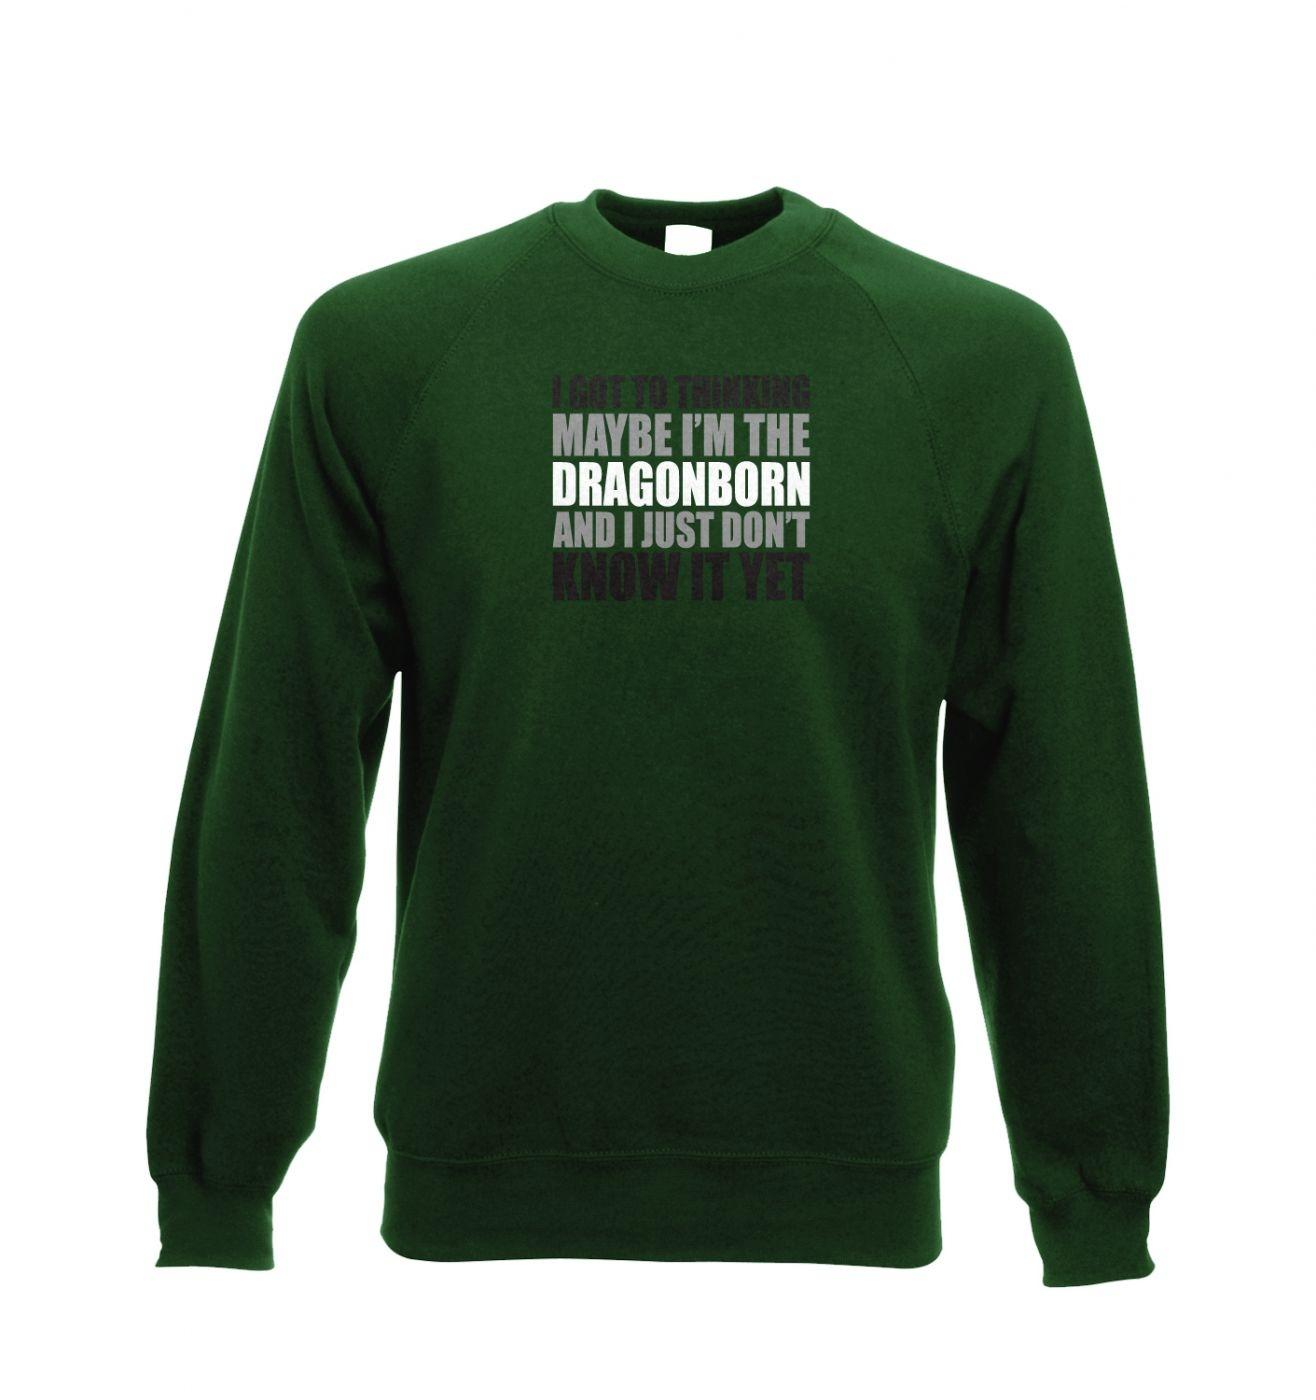 Thinking I'm The Dragonborn crewneck sweatshirt